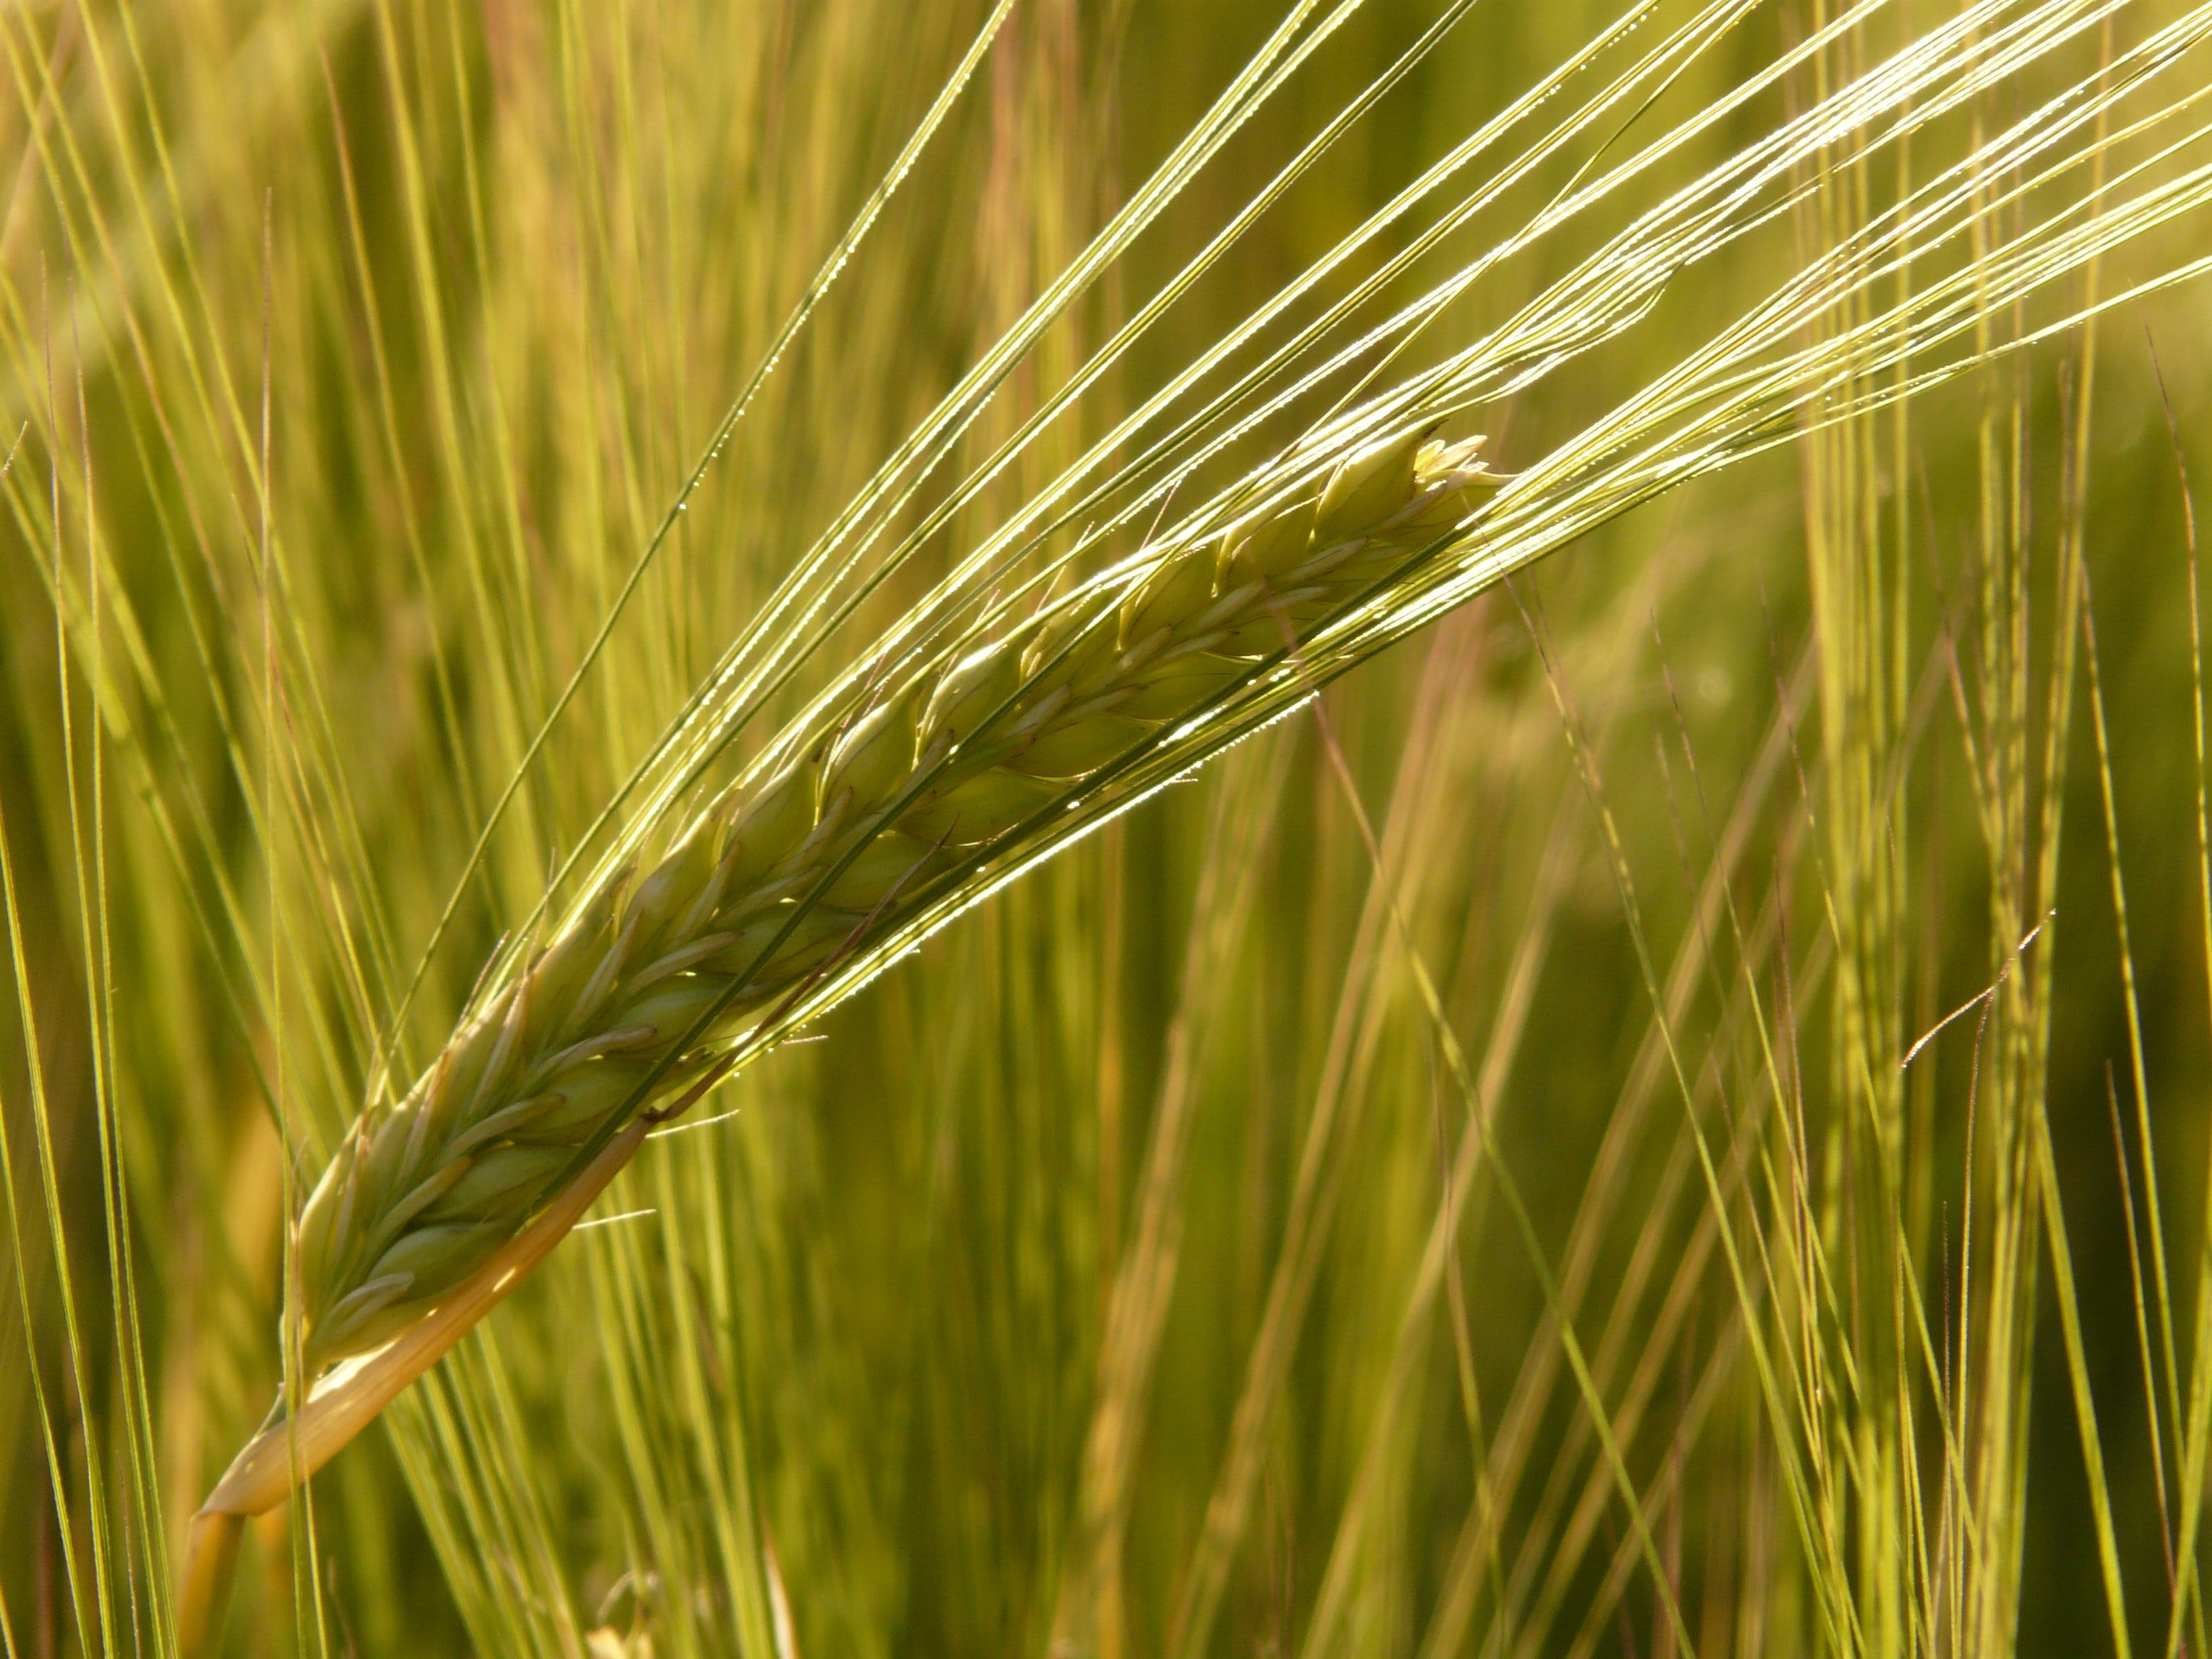 Kostenloses Stock Foto zu feld, gras, pflanze, getreide